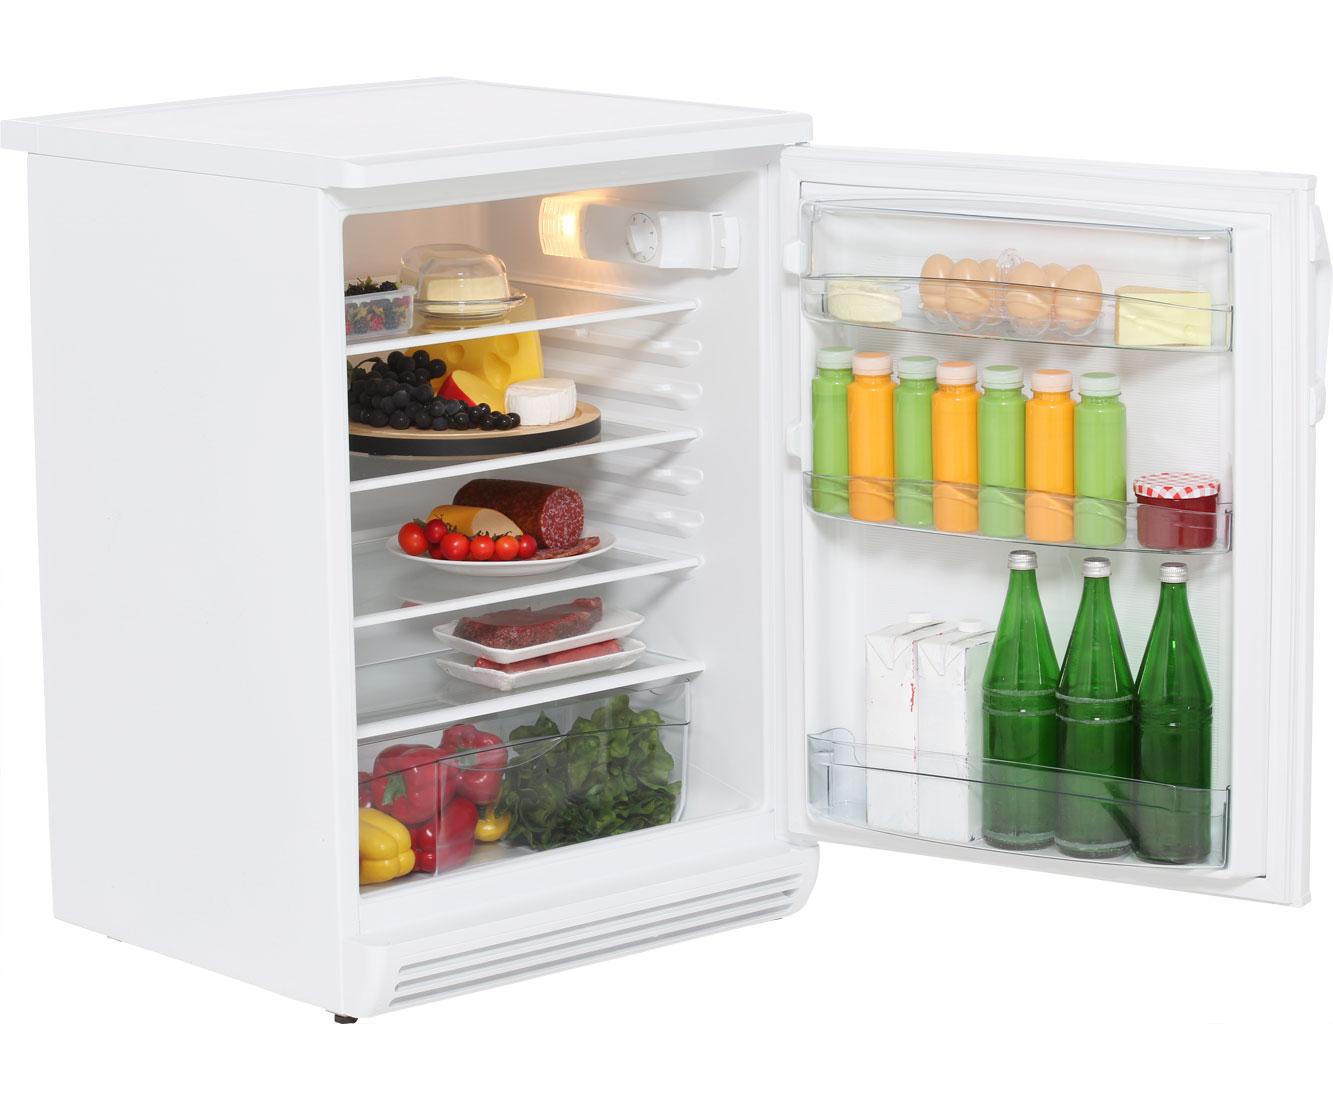 Amica Kühlschrank Retro Test : Retro kühlschrank test vergleich: retro kühlschrank american style